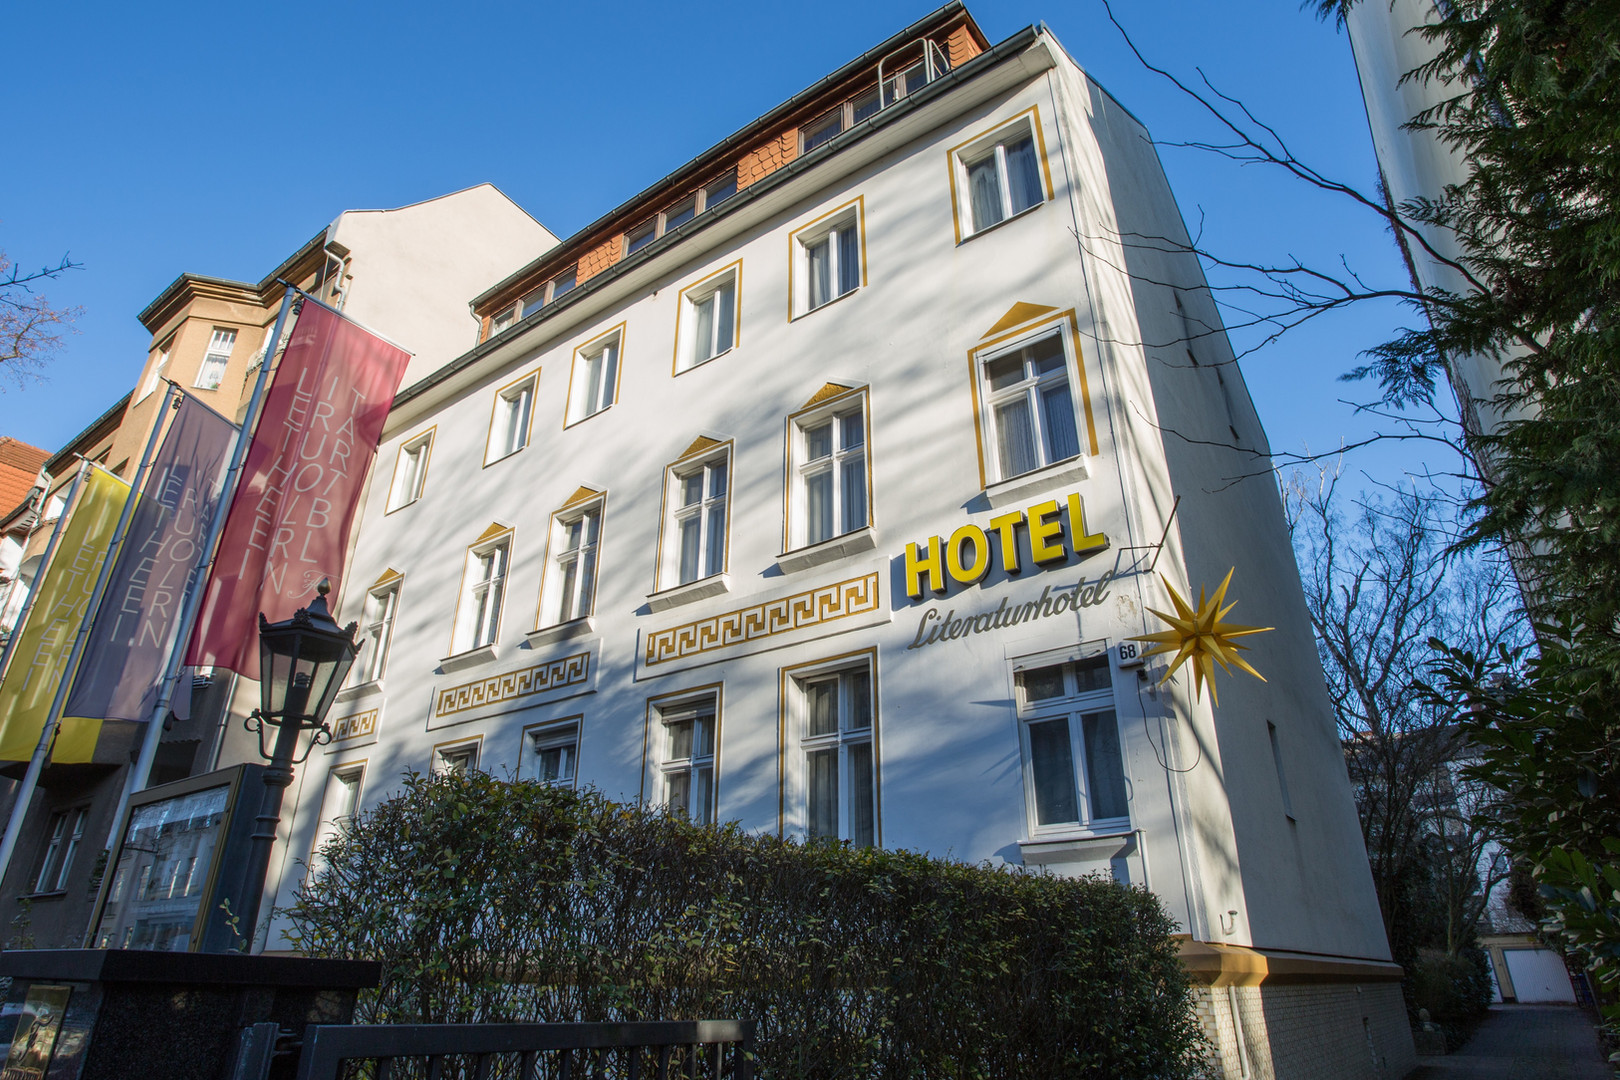 Hotel_Stasse_nah.jpg